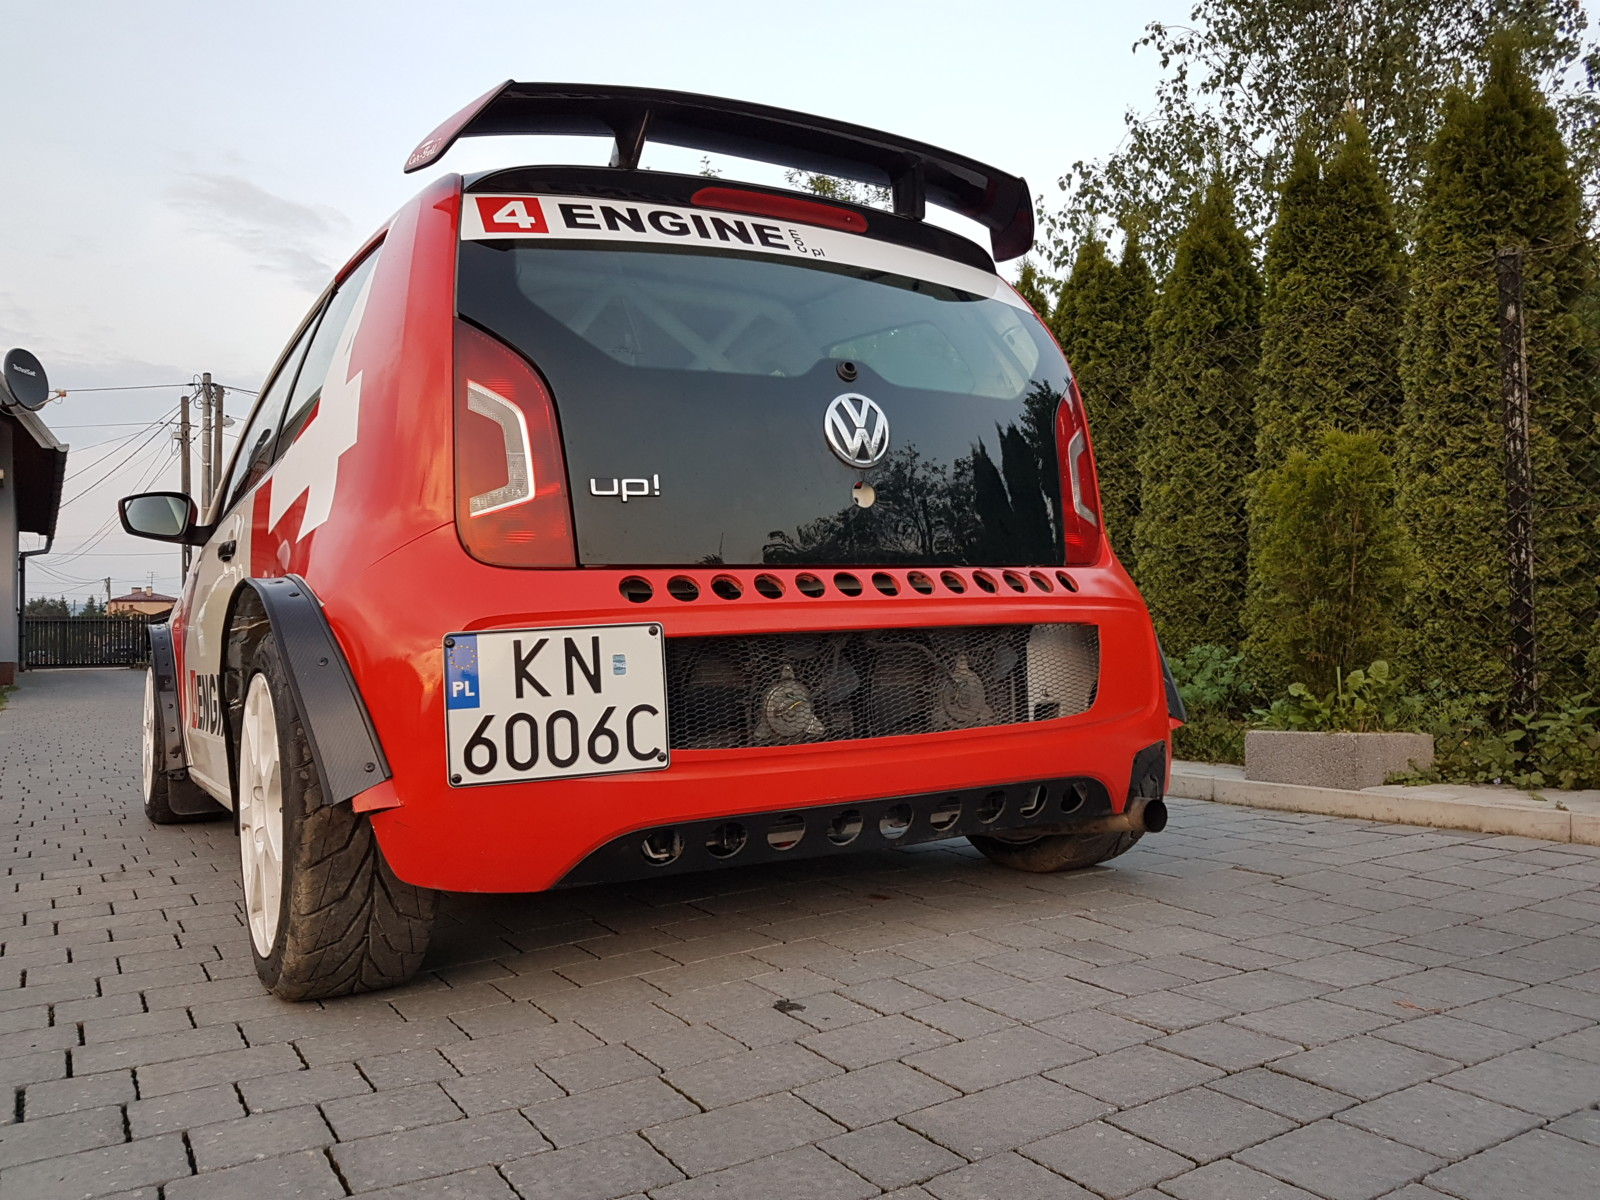 VW_up!_tuning_4engine